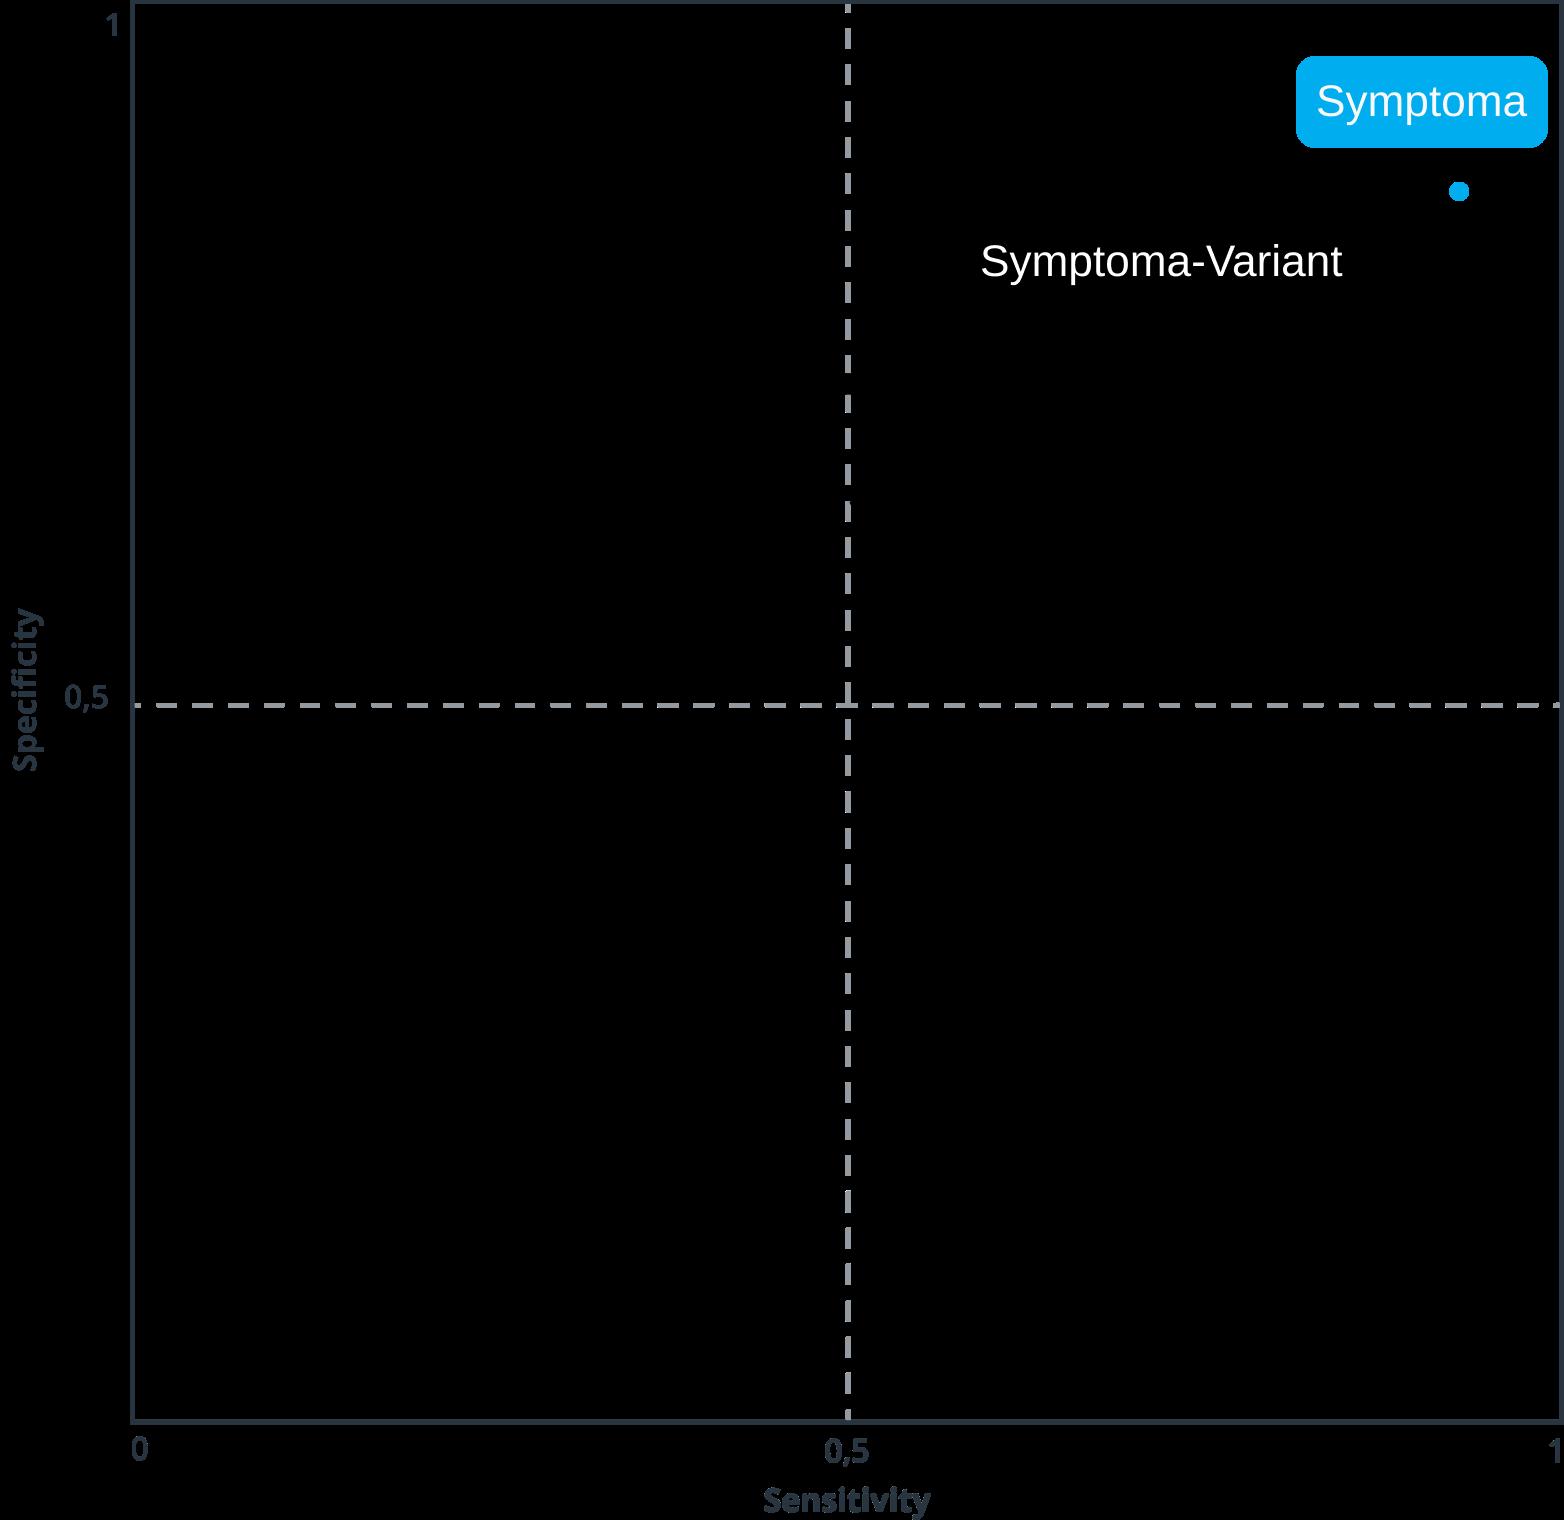 Symptoma performance